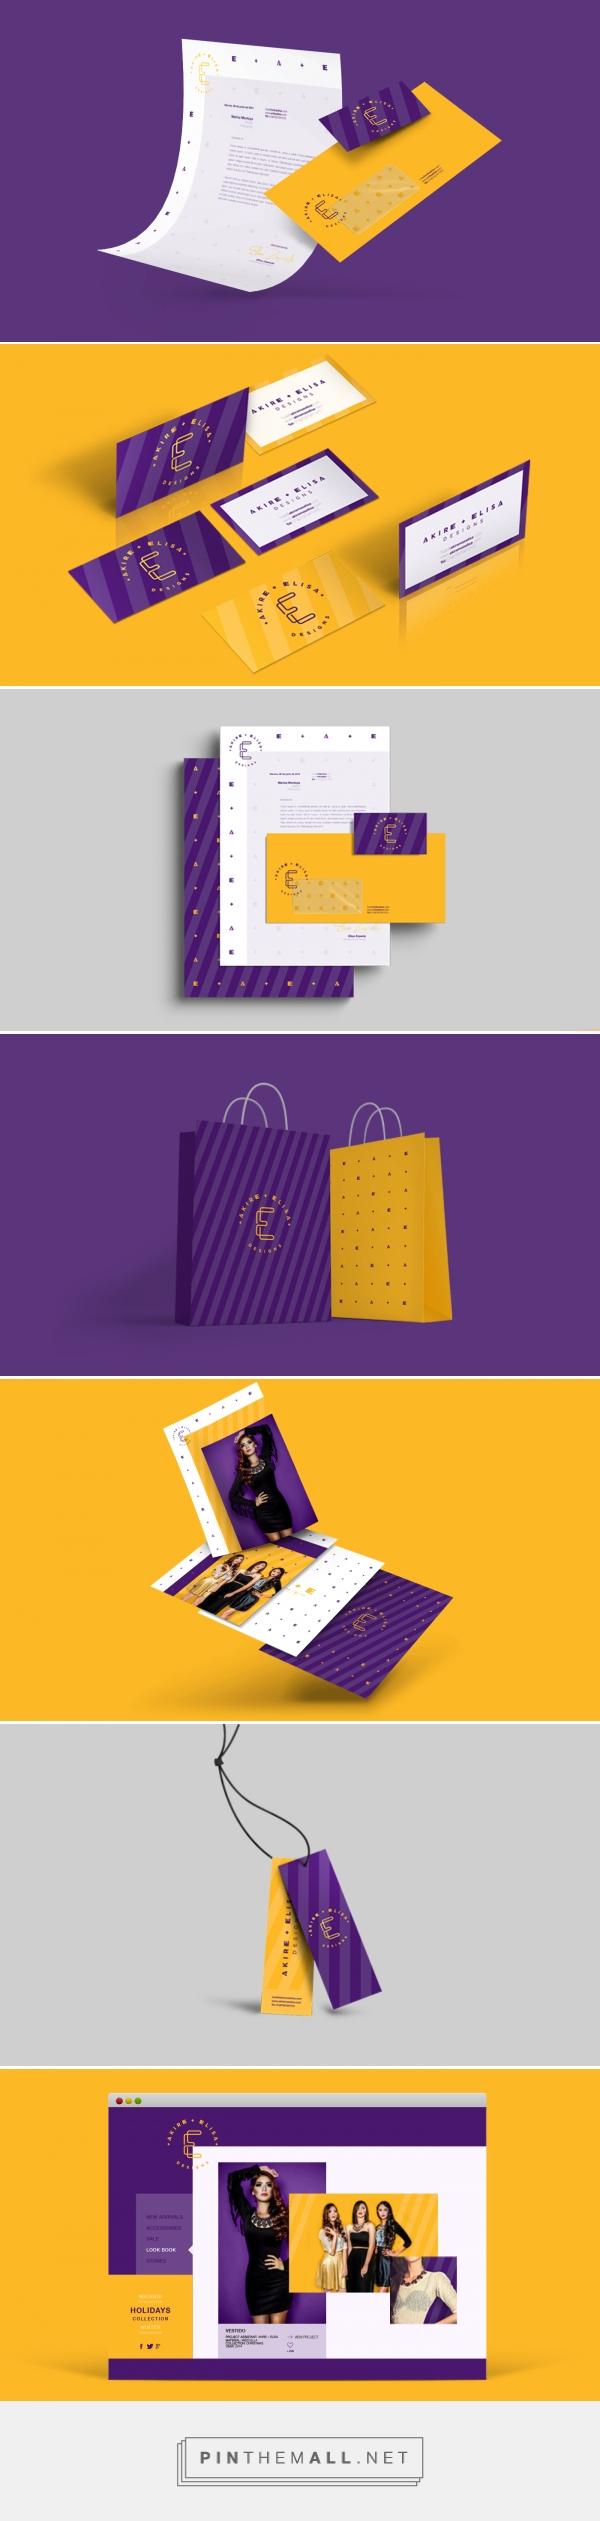 Akire + Elisa Designs / Proposal on Behance | Fivestar Branding – Design and Branding Agency & Inspiration Gallery